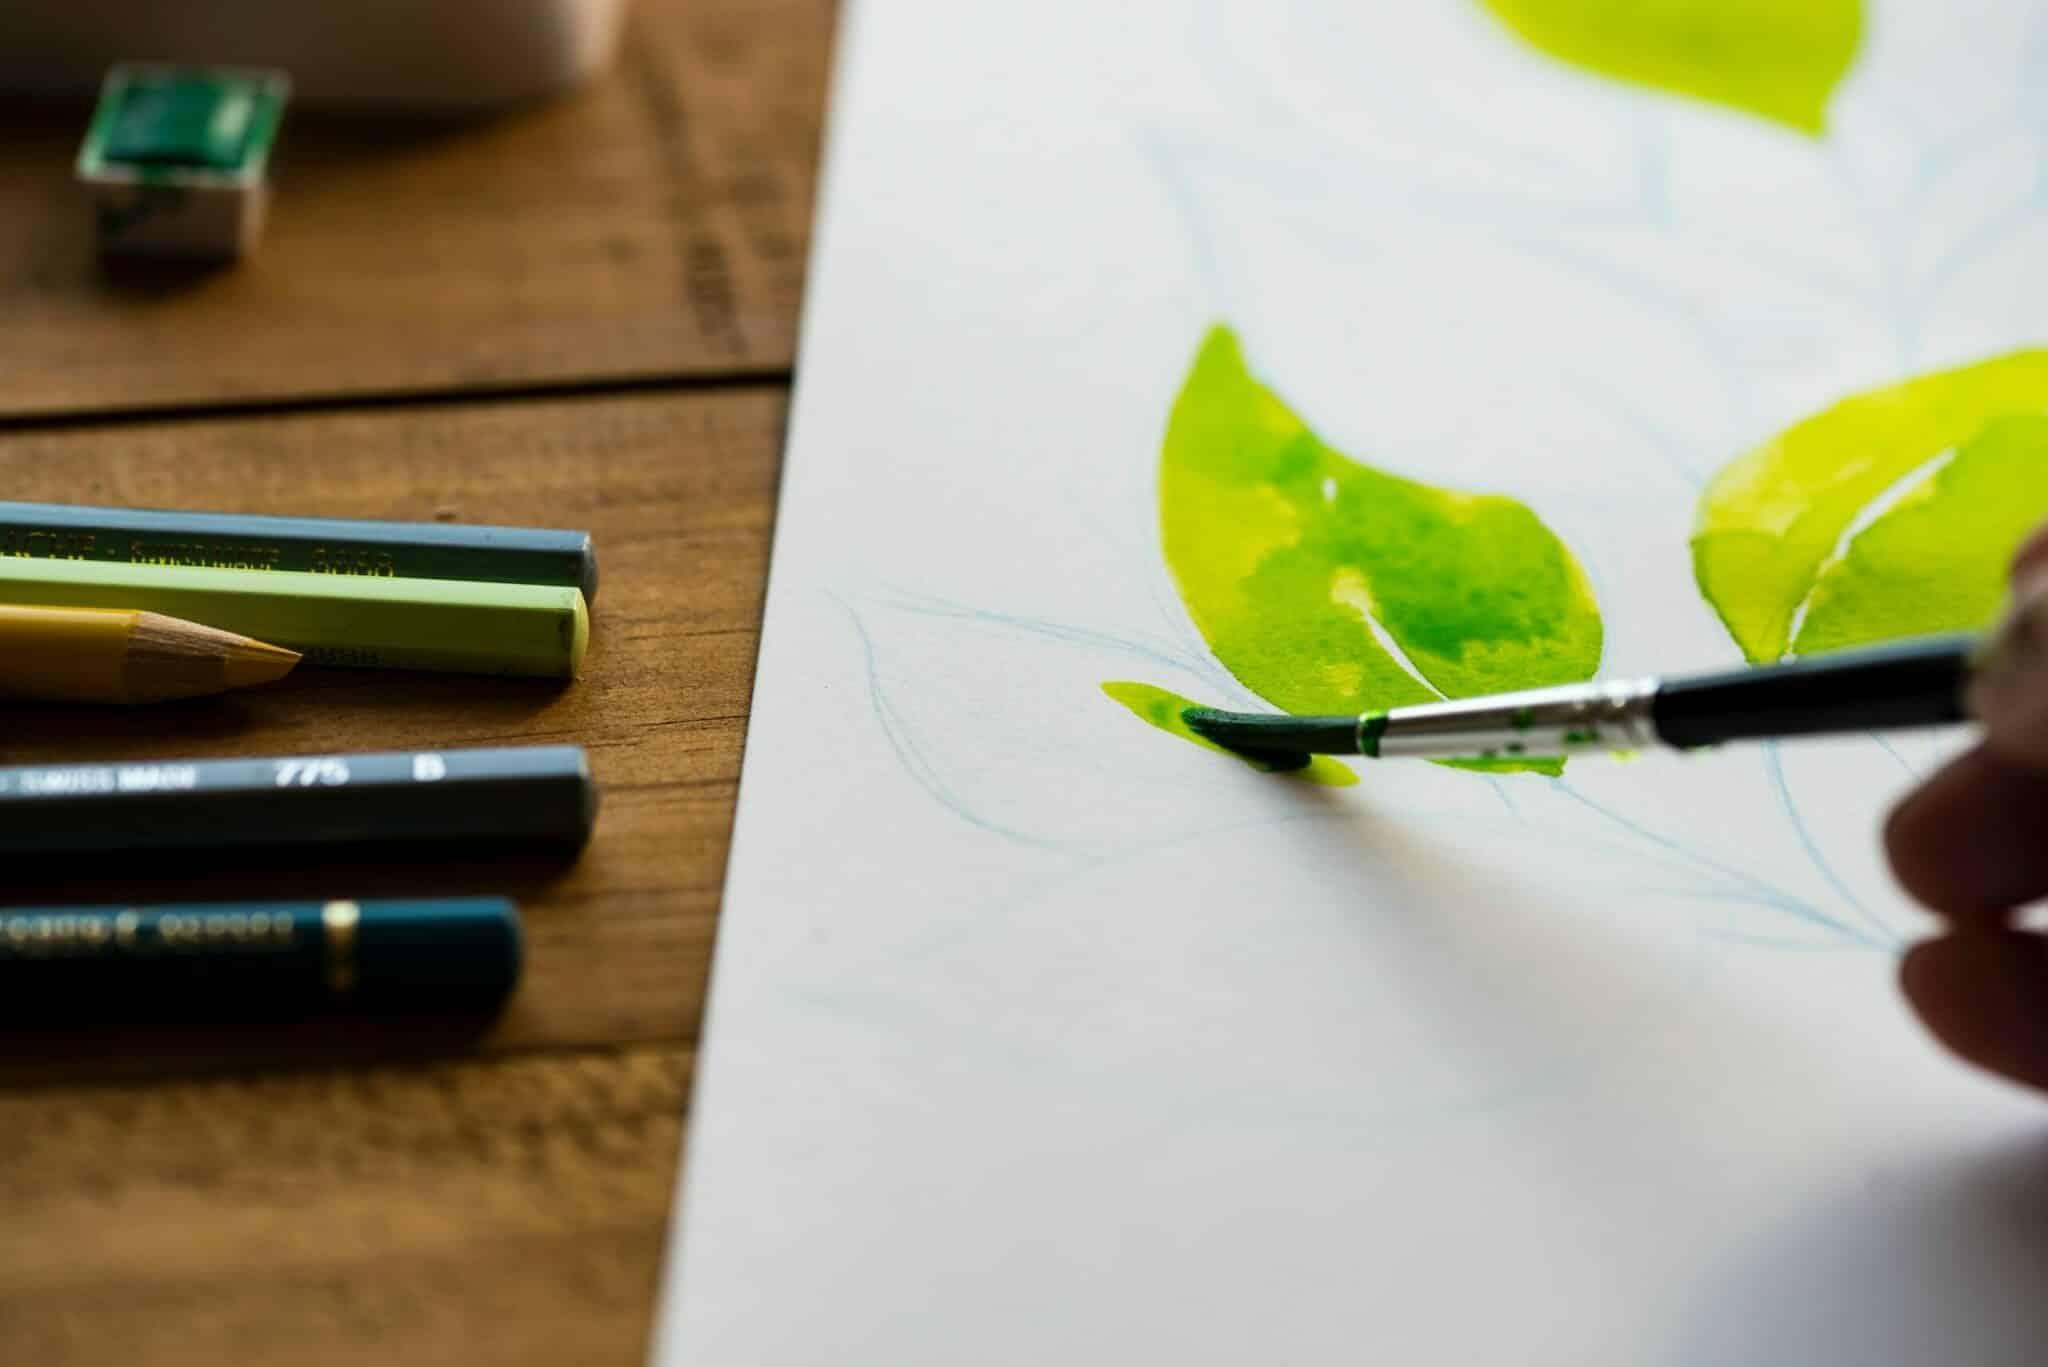 kratom and creativity